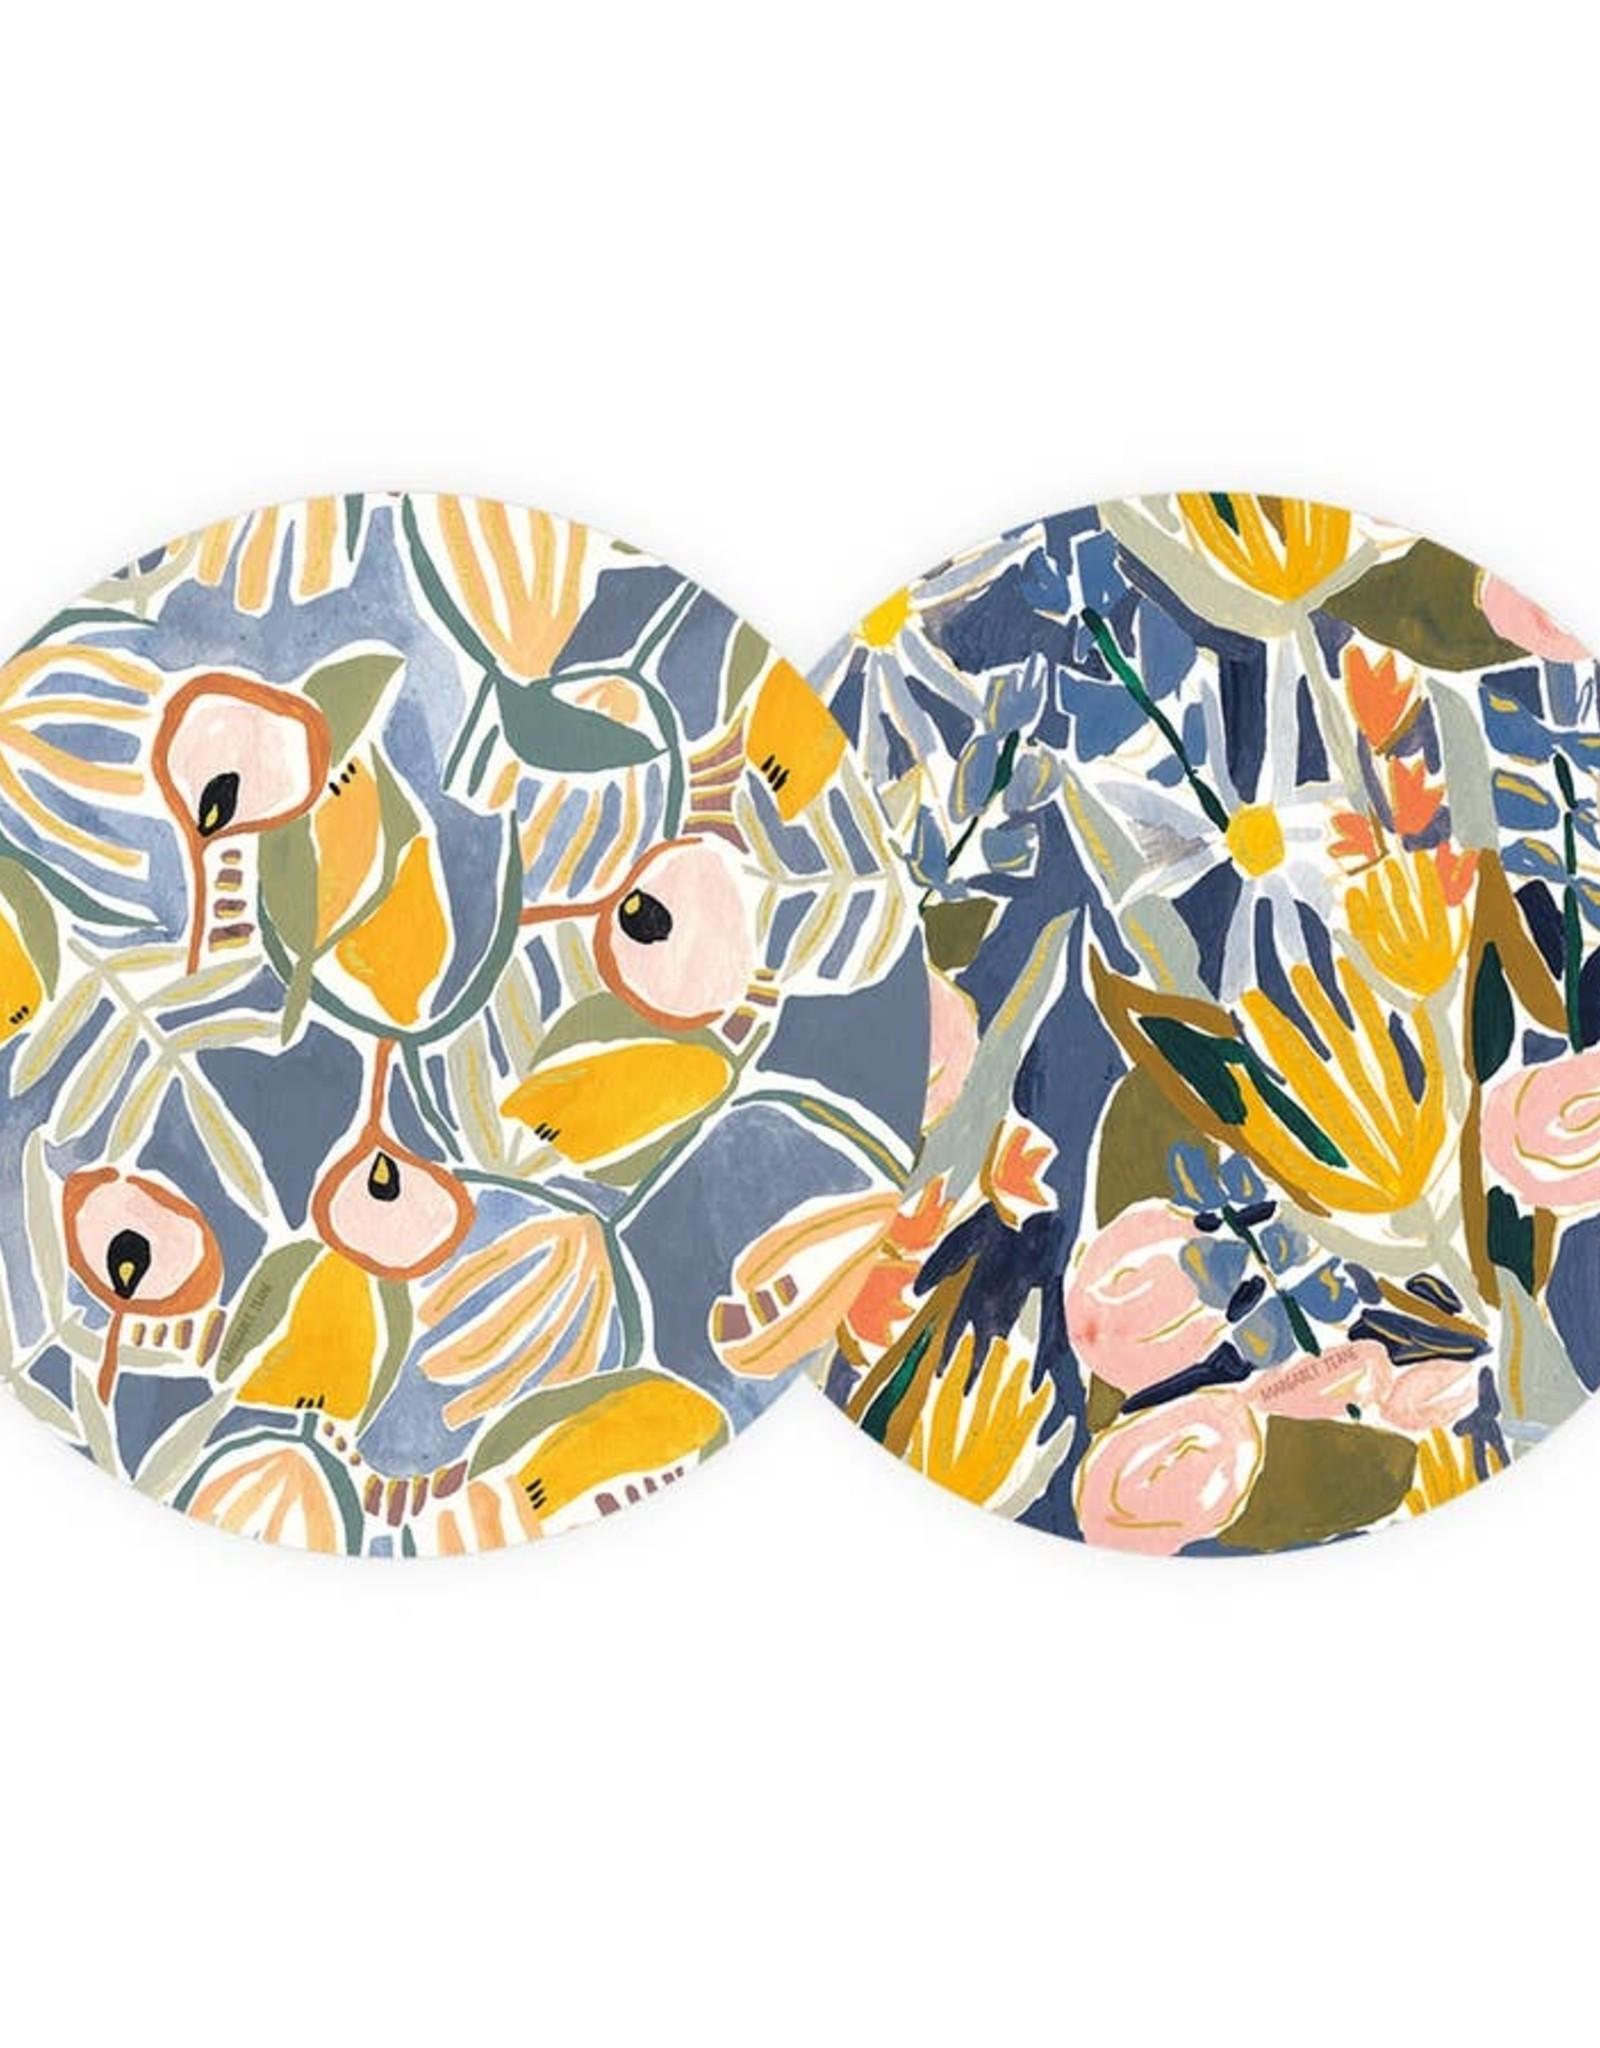 Seedlings Seedlings | Blue and Yellow Floral Coaster Set (6)